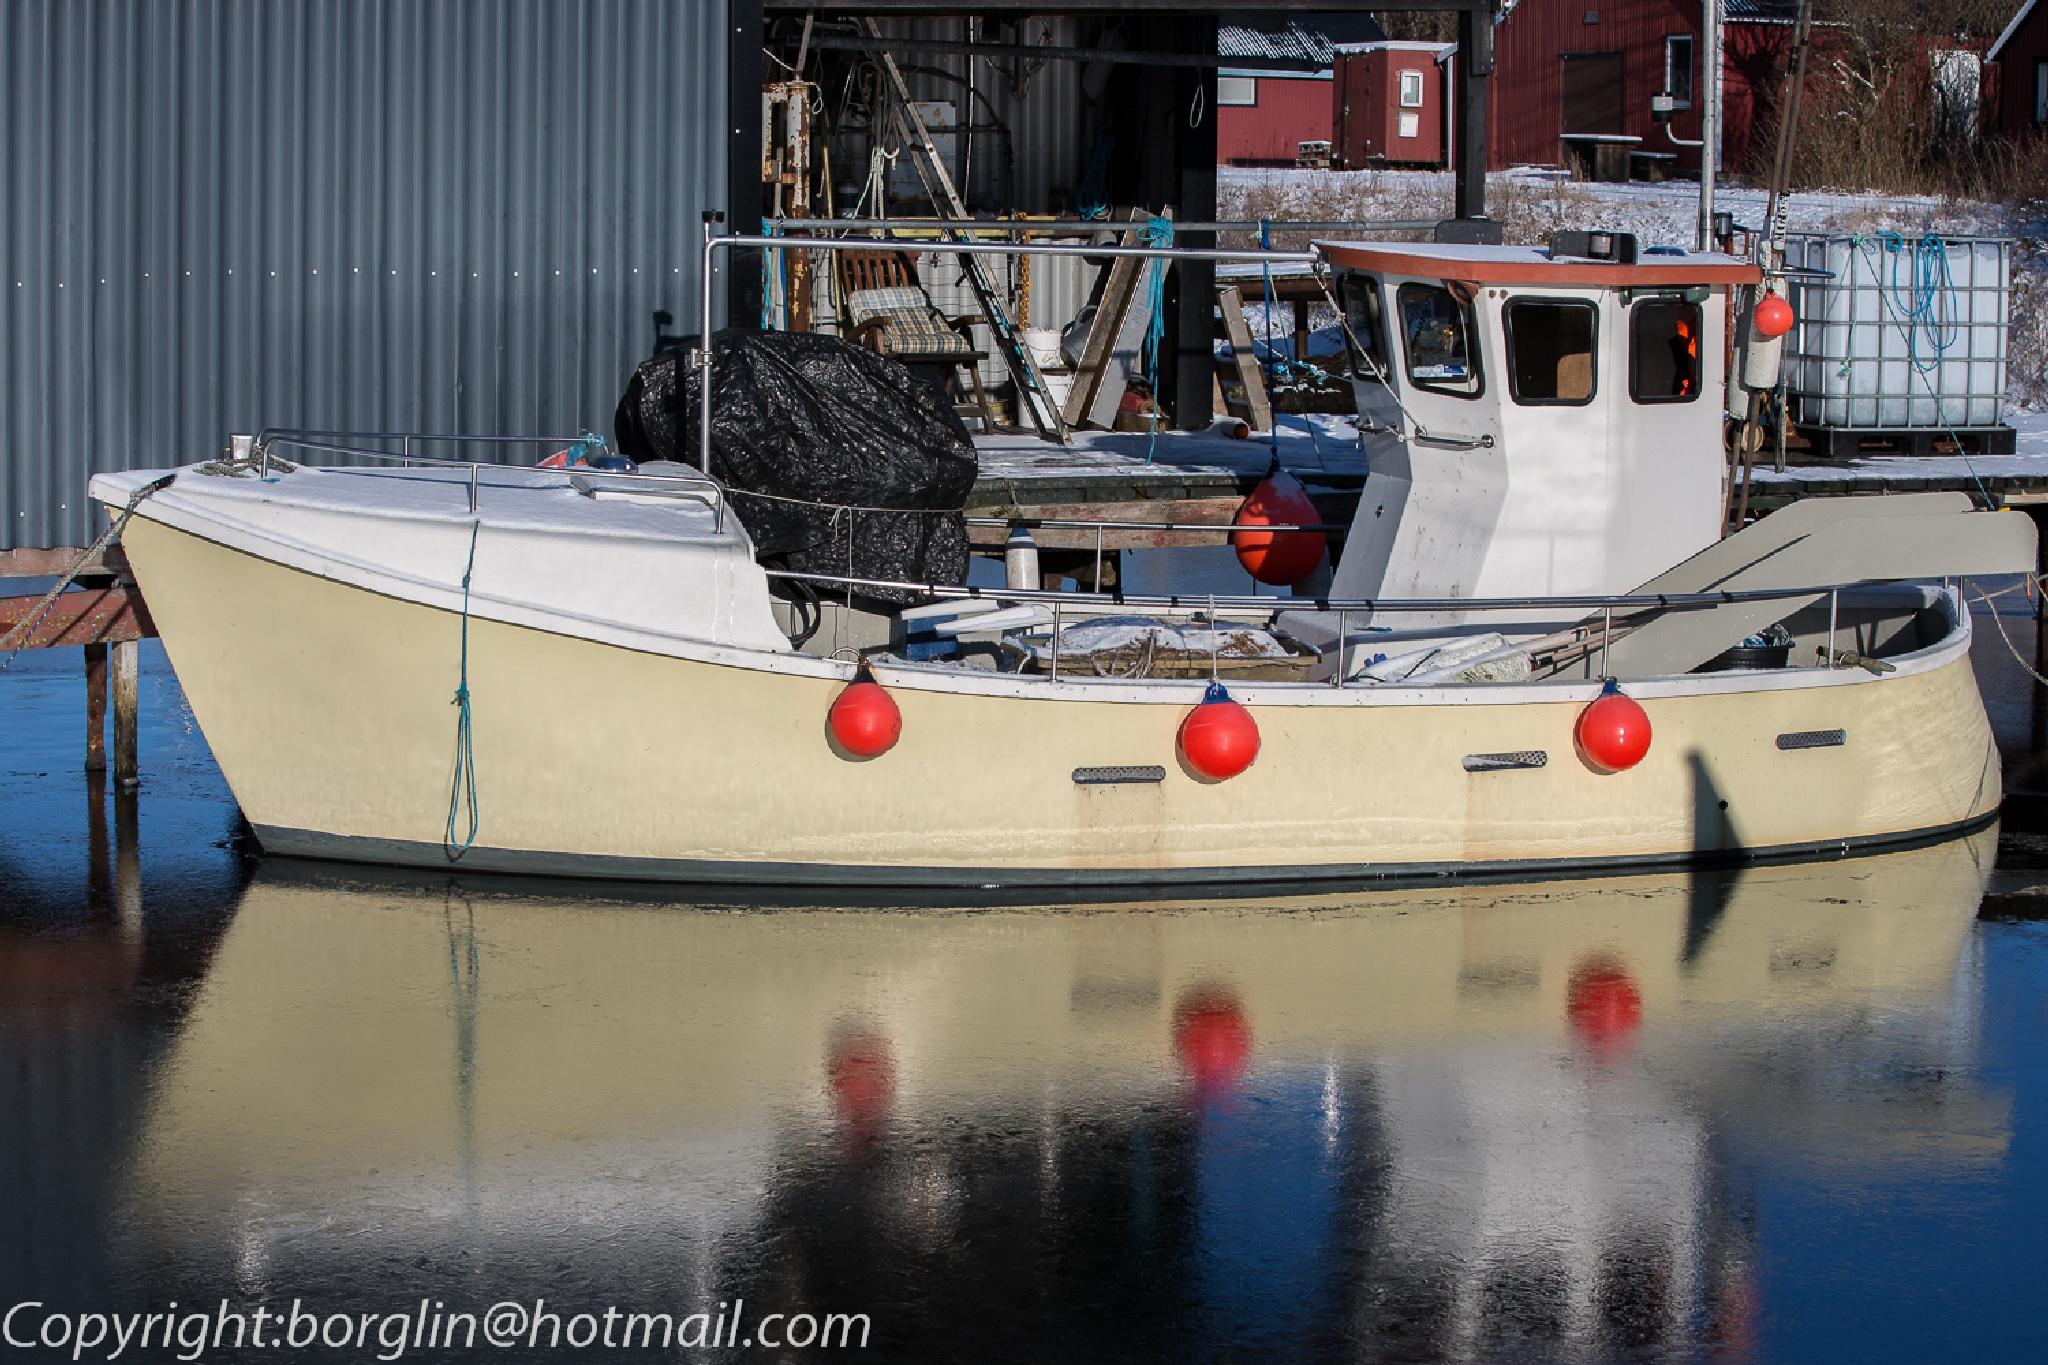 Fiskebåt                Fishing boat by Mats Borglin